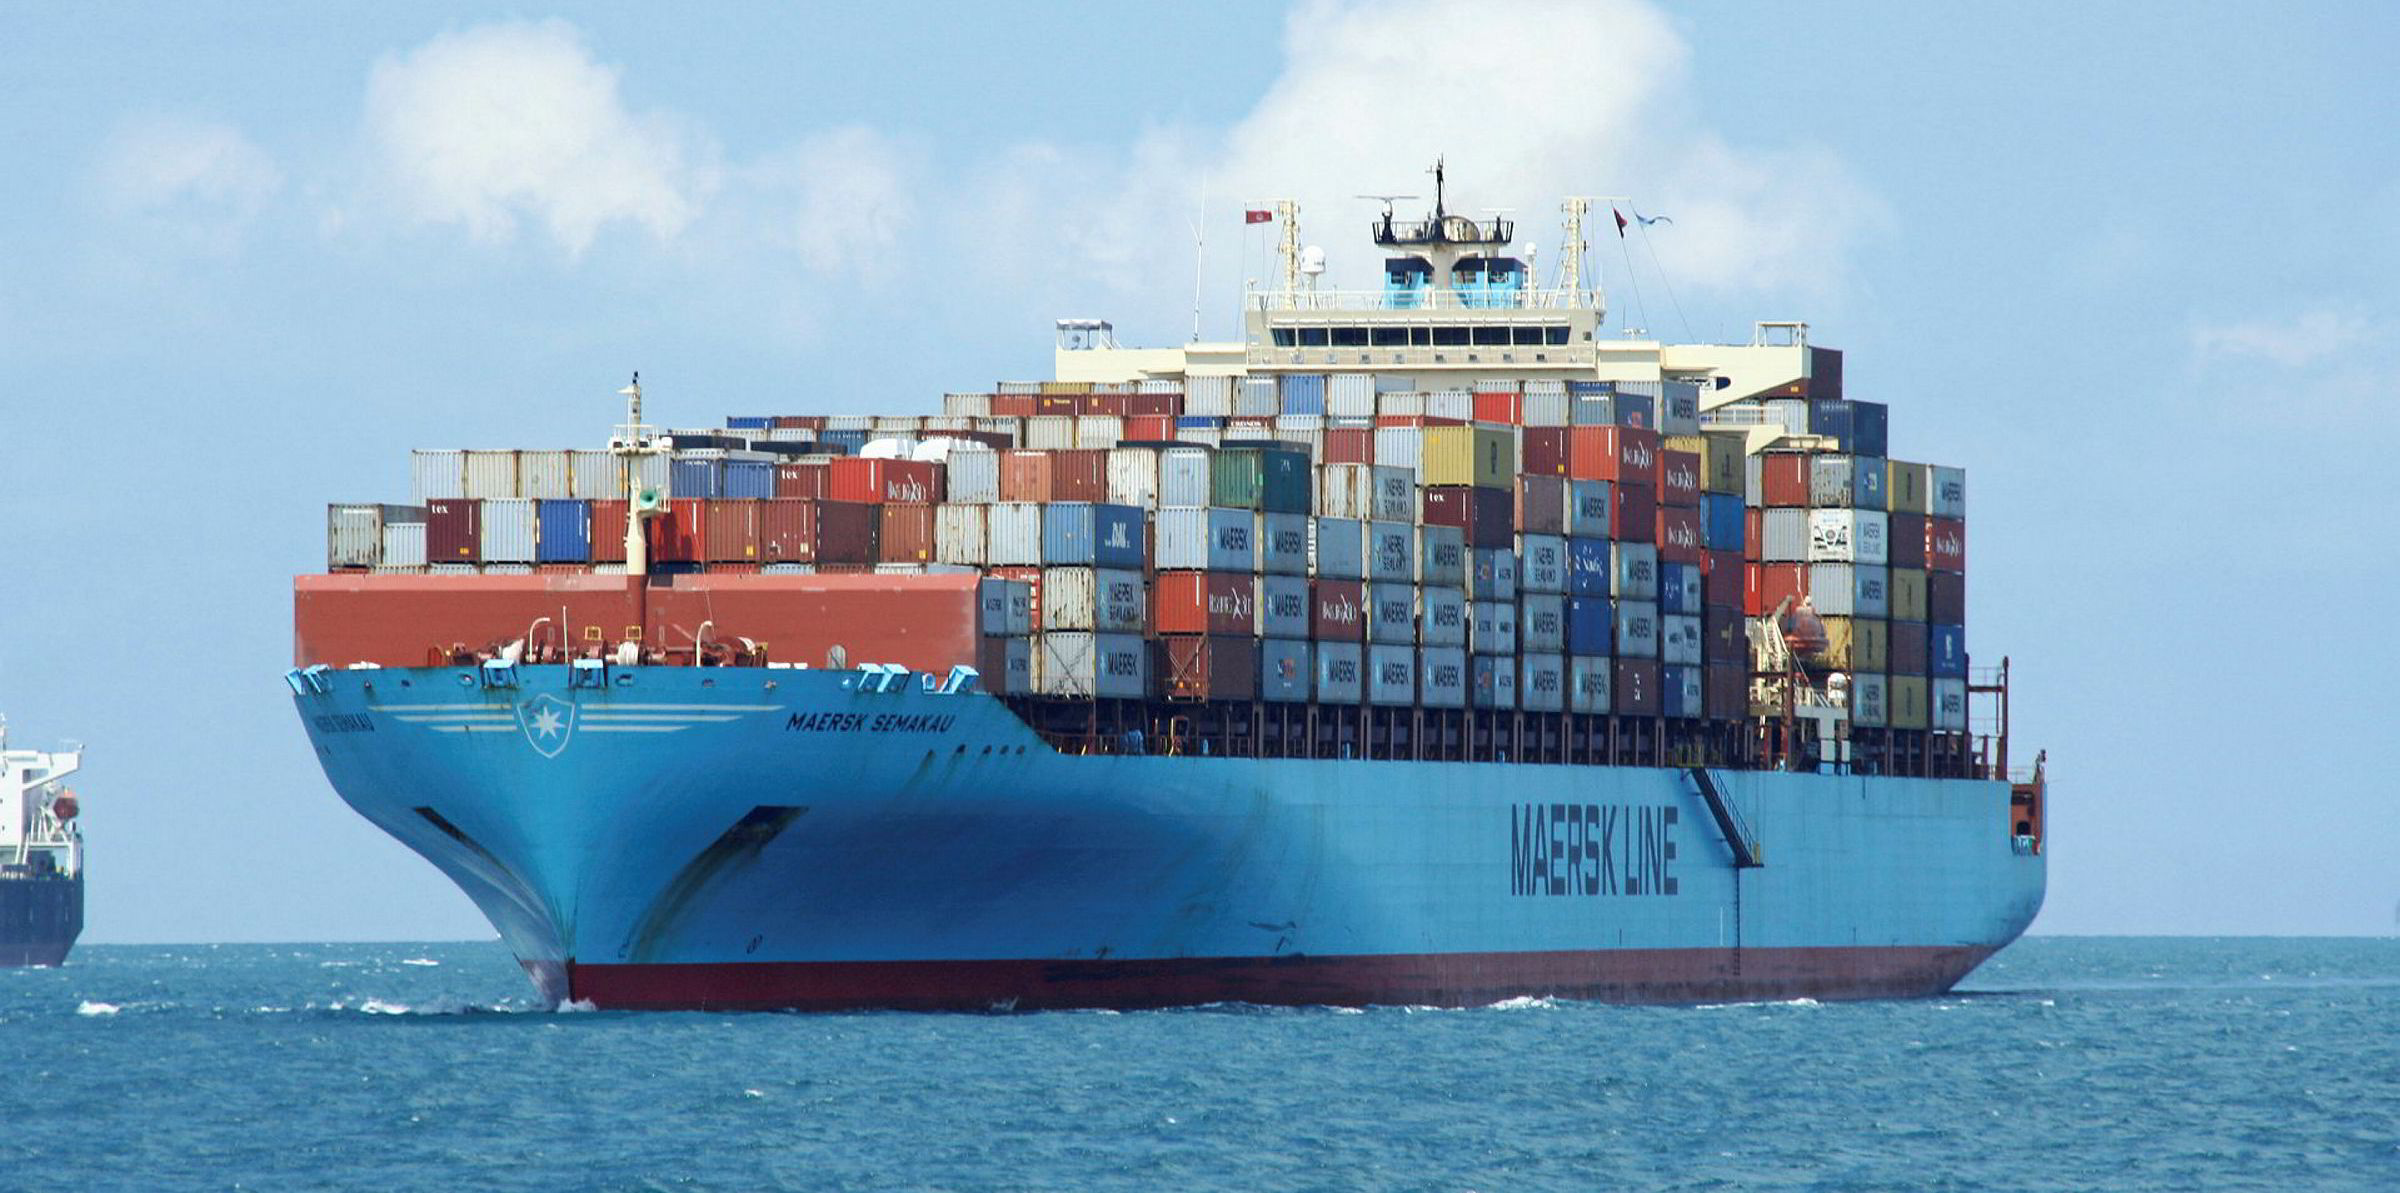 Ap Moller Maersk